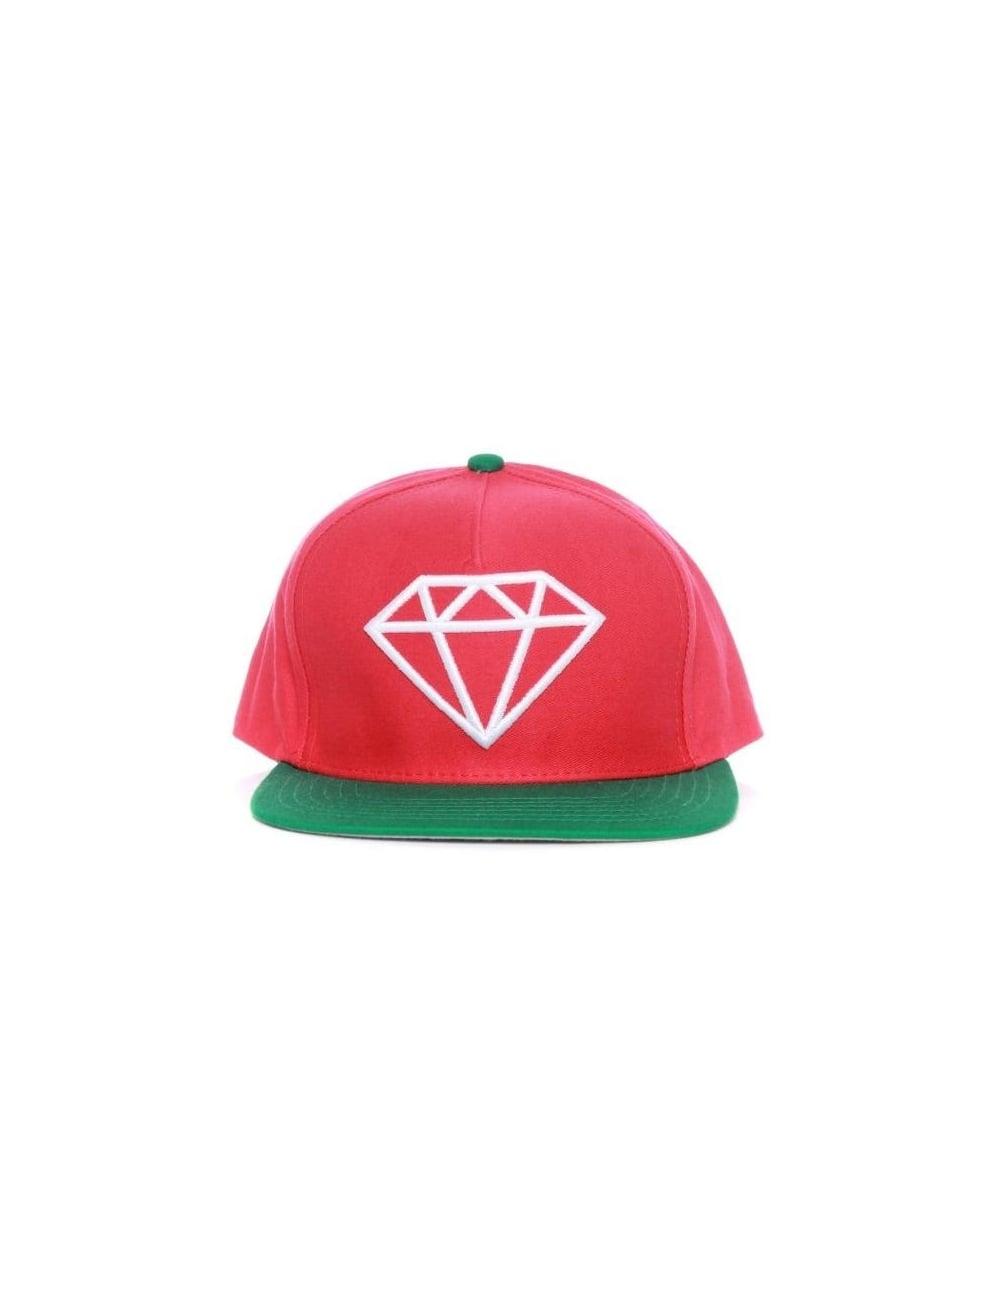 b759933b9b4 Diamond Supply Co Rock Snapback Hat - Red Green - Hat Shop from Fat ...